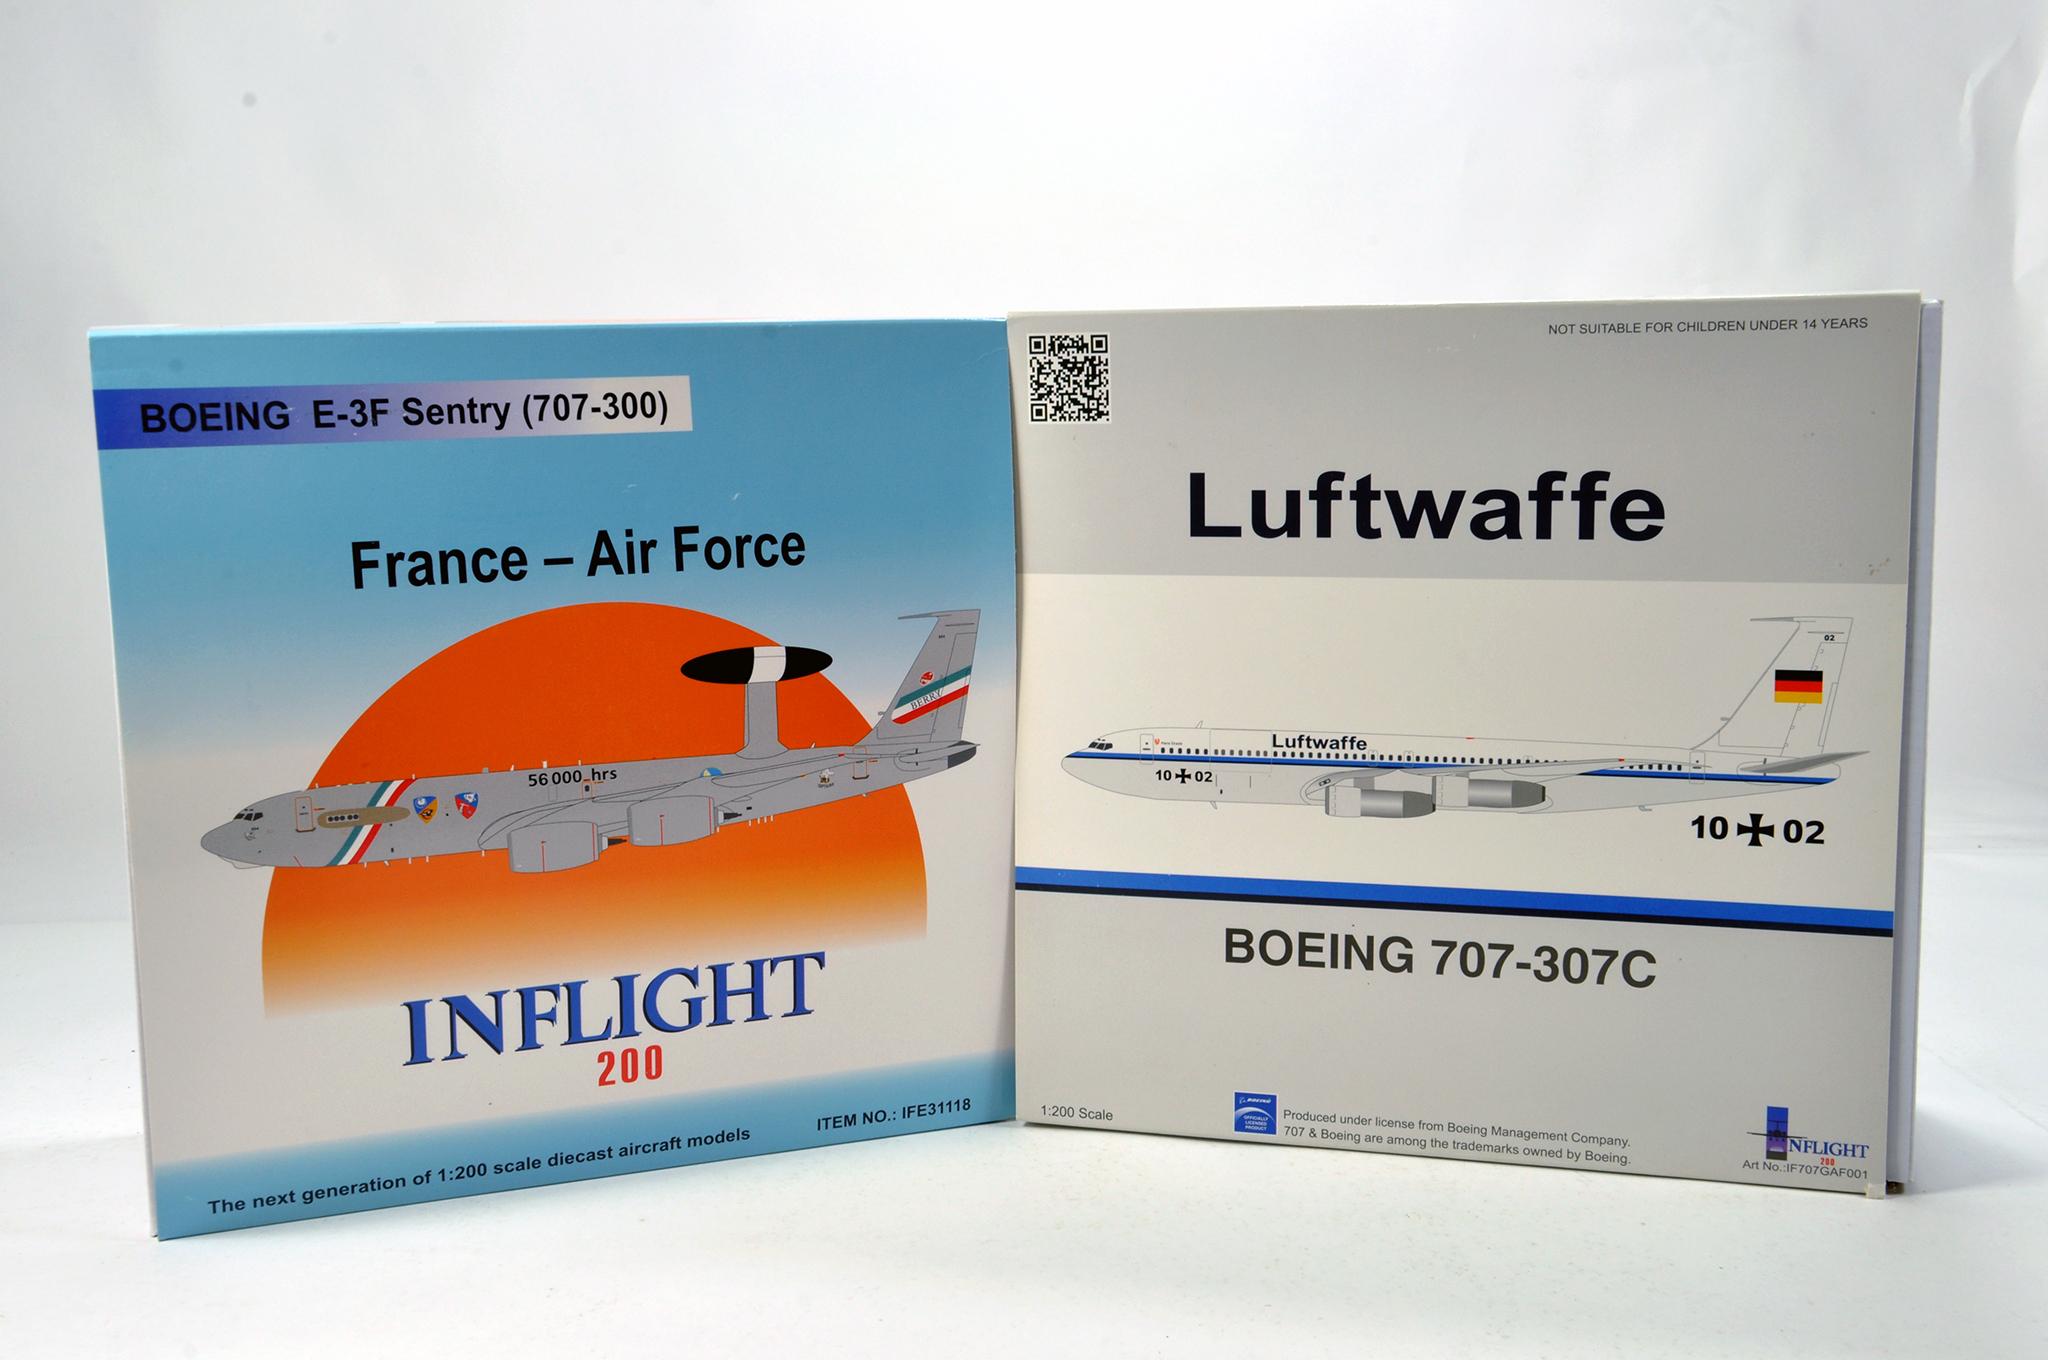 Lot 33 - Inflight Models 1/200 Diecast Aircraft Models comprising Boeing 707-307C Luftwaffe plus Boeing E-